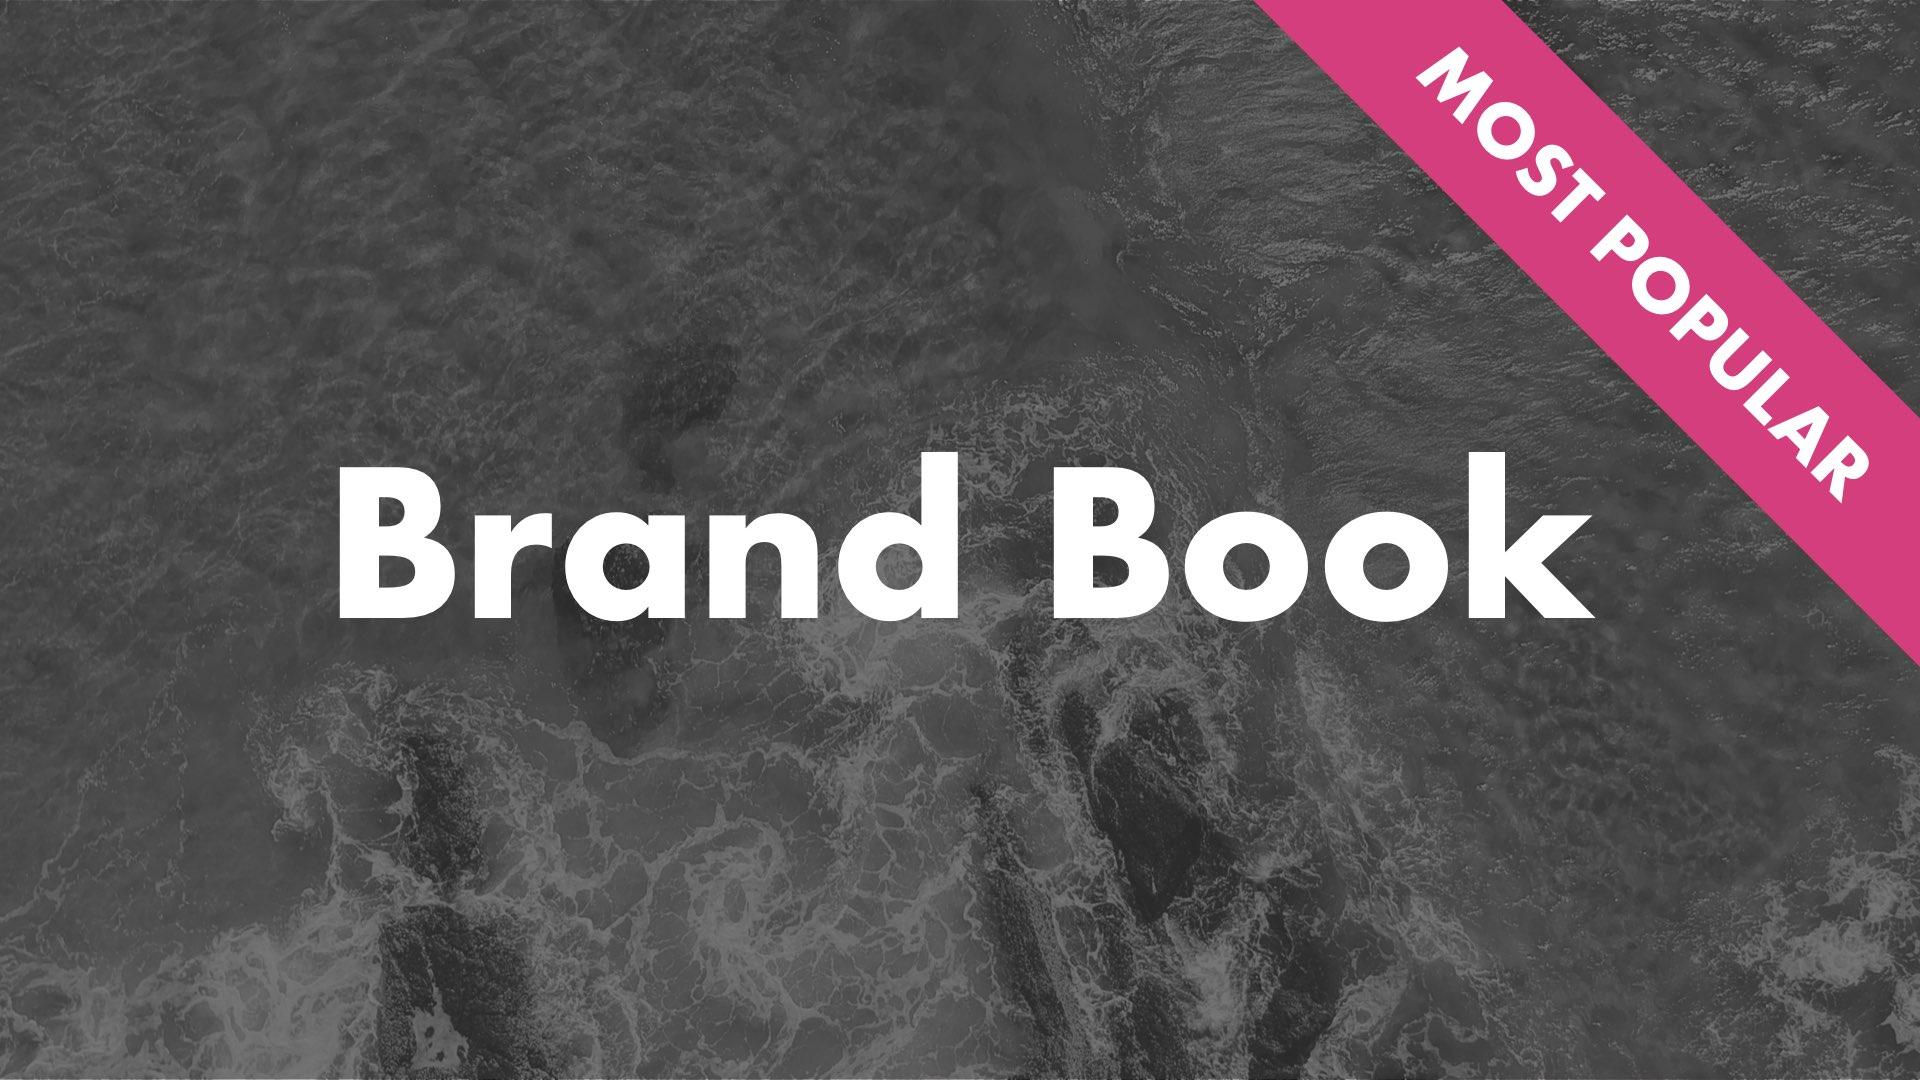 1900€ - Analysis of your brandA custom designed logotypeLogo usage guidelines+ Typography+ Brand pattern+ Stock image collection———